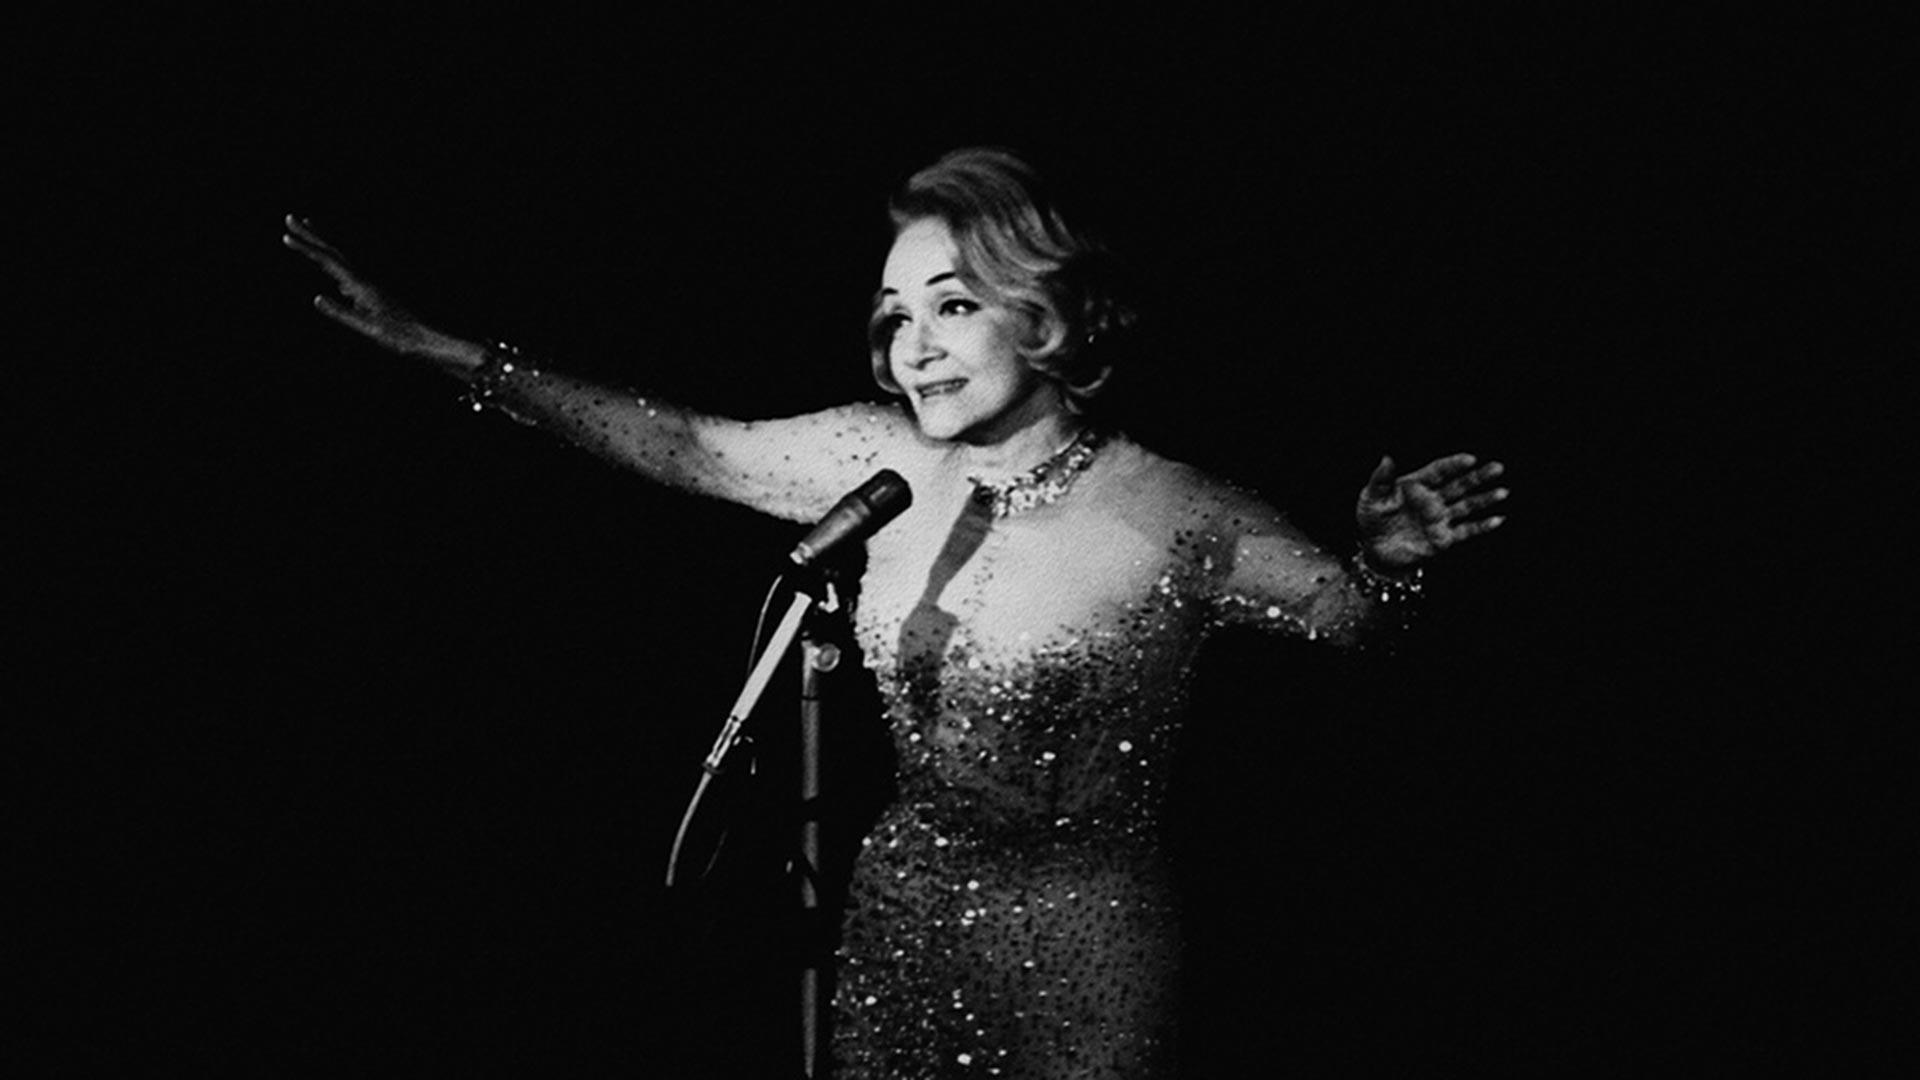 Marlene Dietrich na turneji v ZSSR, 1964